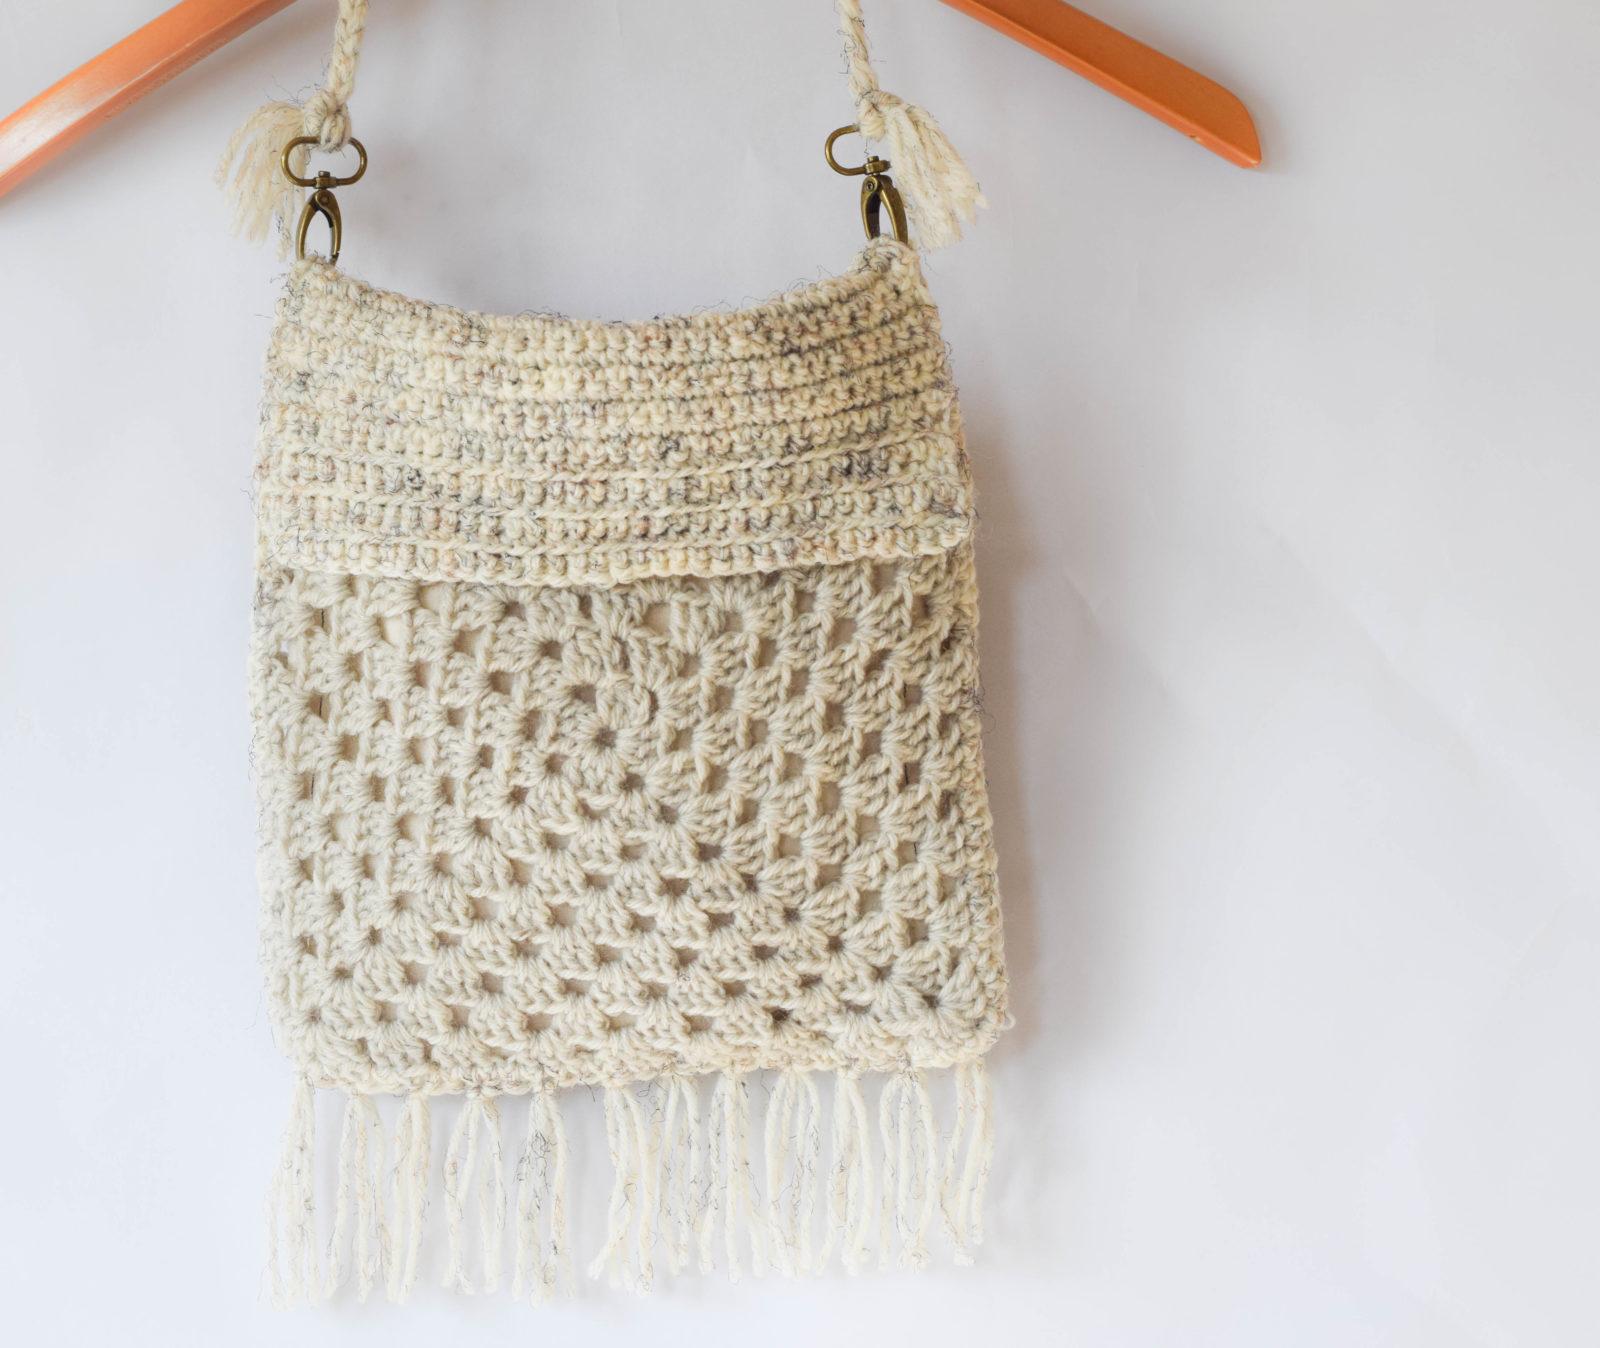 Crochet Backpack Bag Pattern : Boho Fringe Granny Square Crochet Purse ? Mama In A Stitch